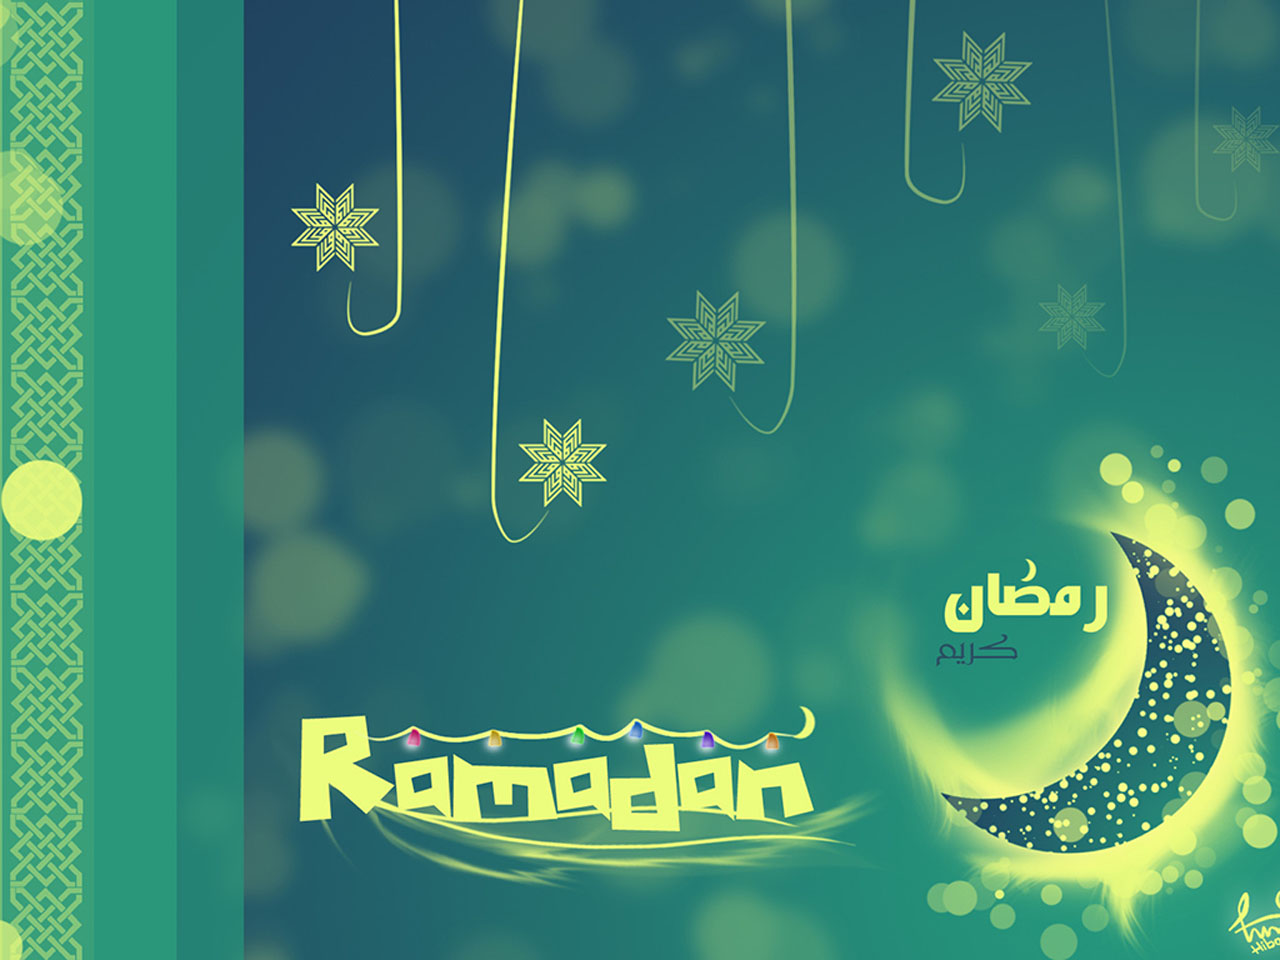 ramadan background hd wallpapers